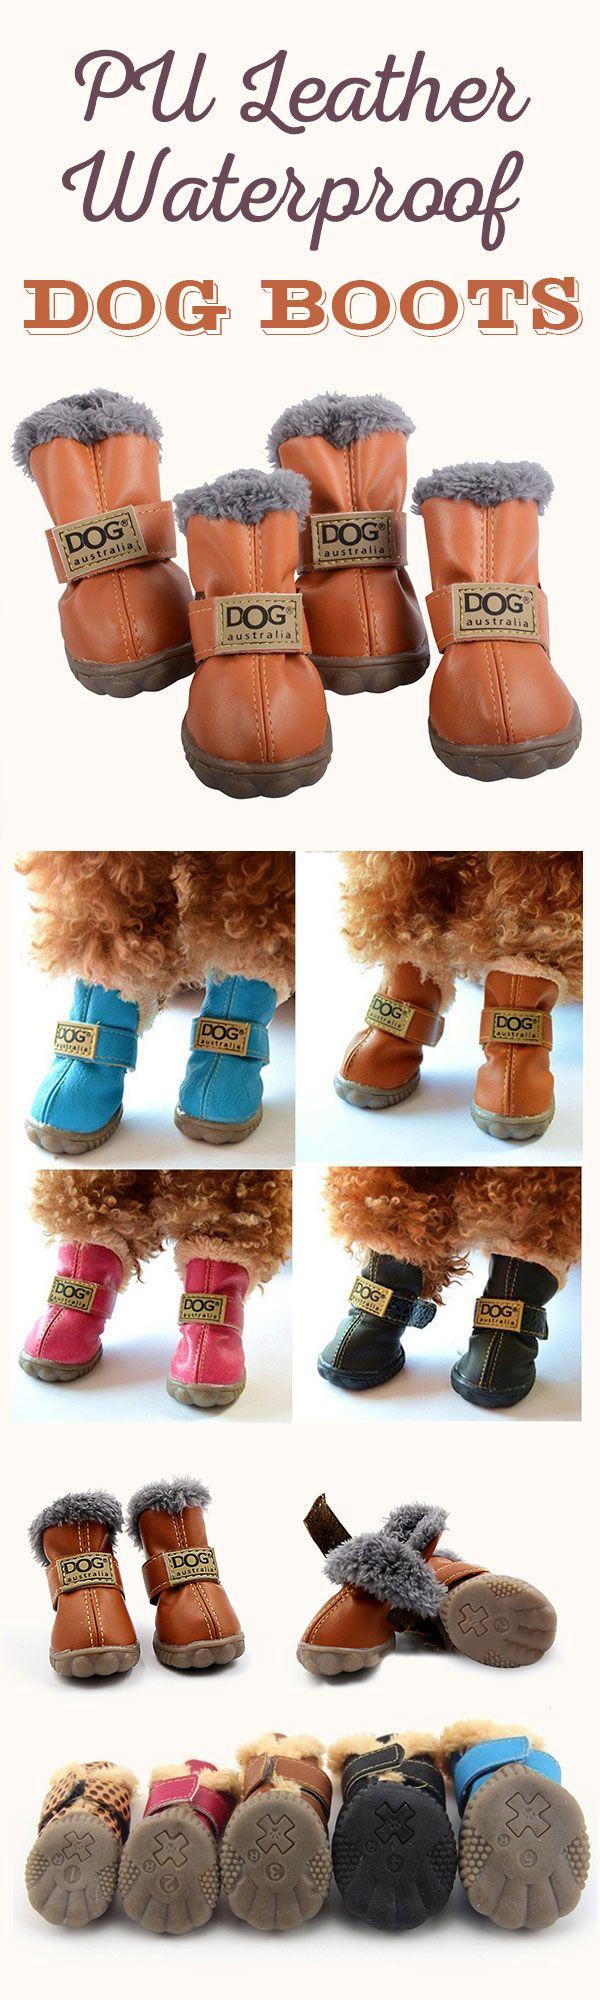 PU Leather Dog Waterproof Boots Winter Soft Warm Anti-slip Snow Booties Shoes 4Pcs#newchic#pet#waterproof